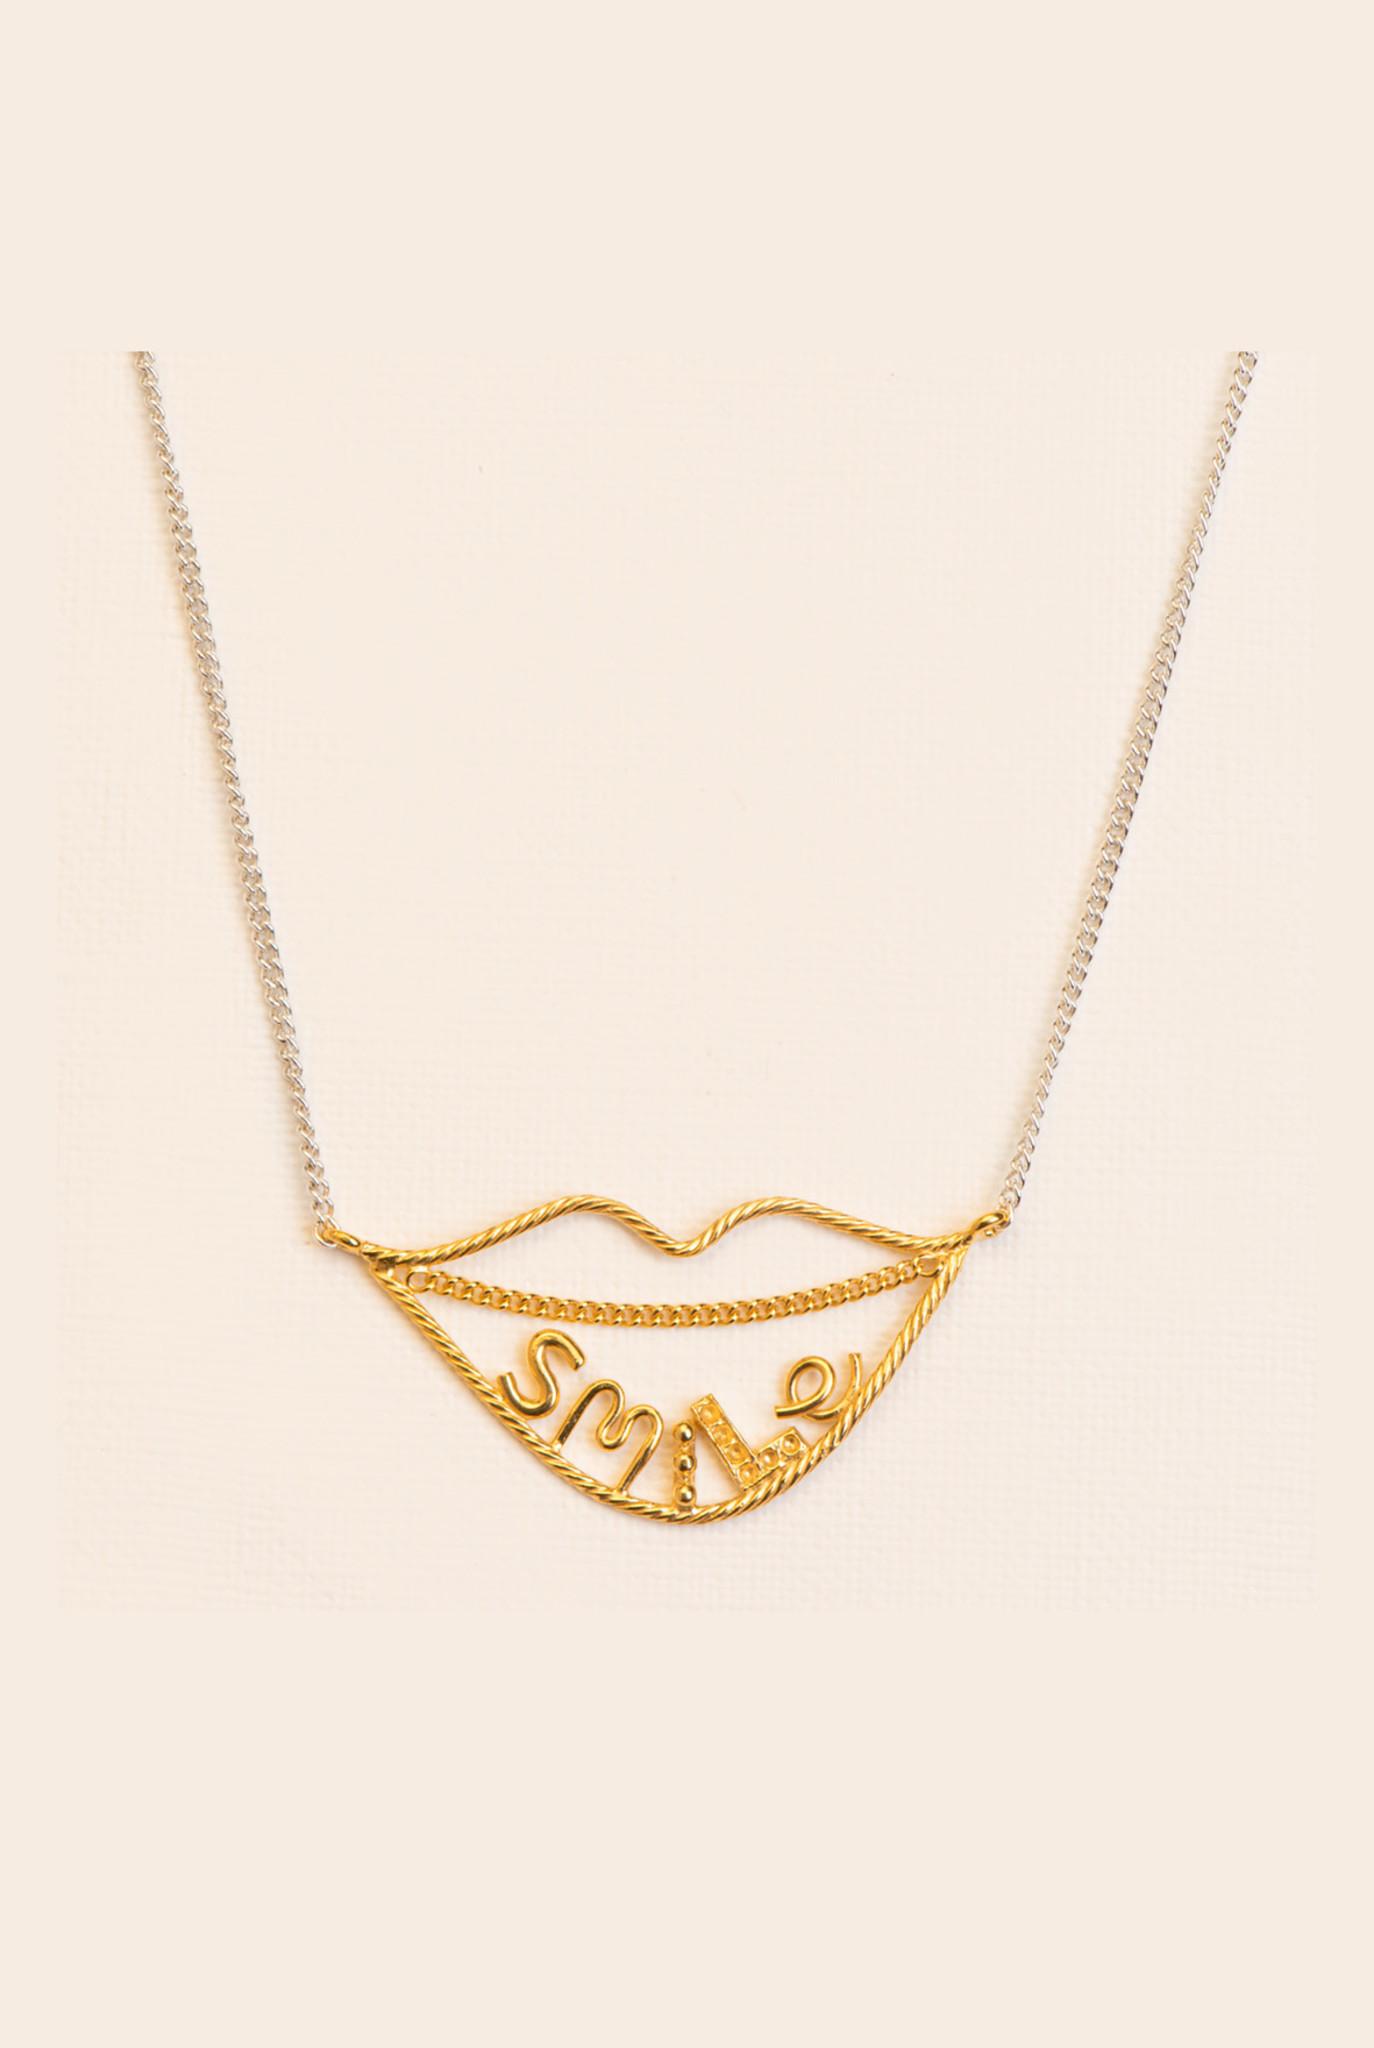 Fine smile necklace